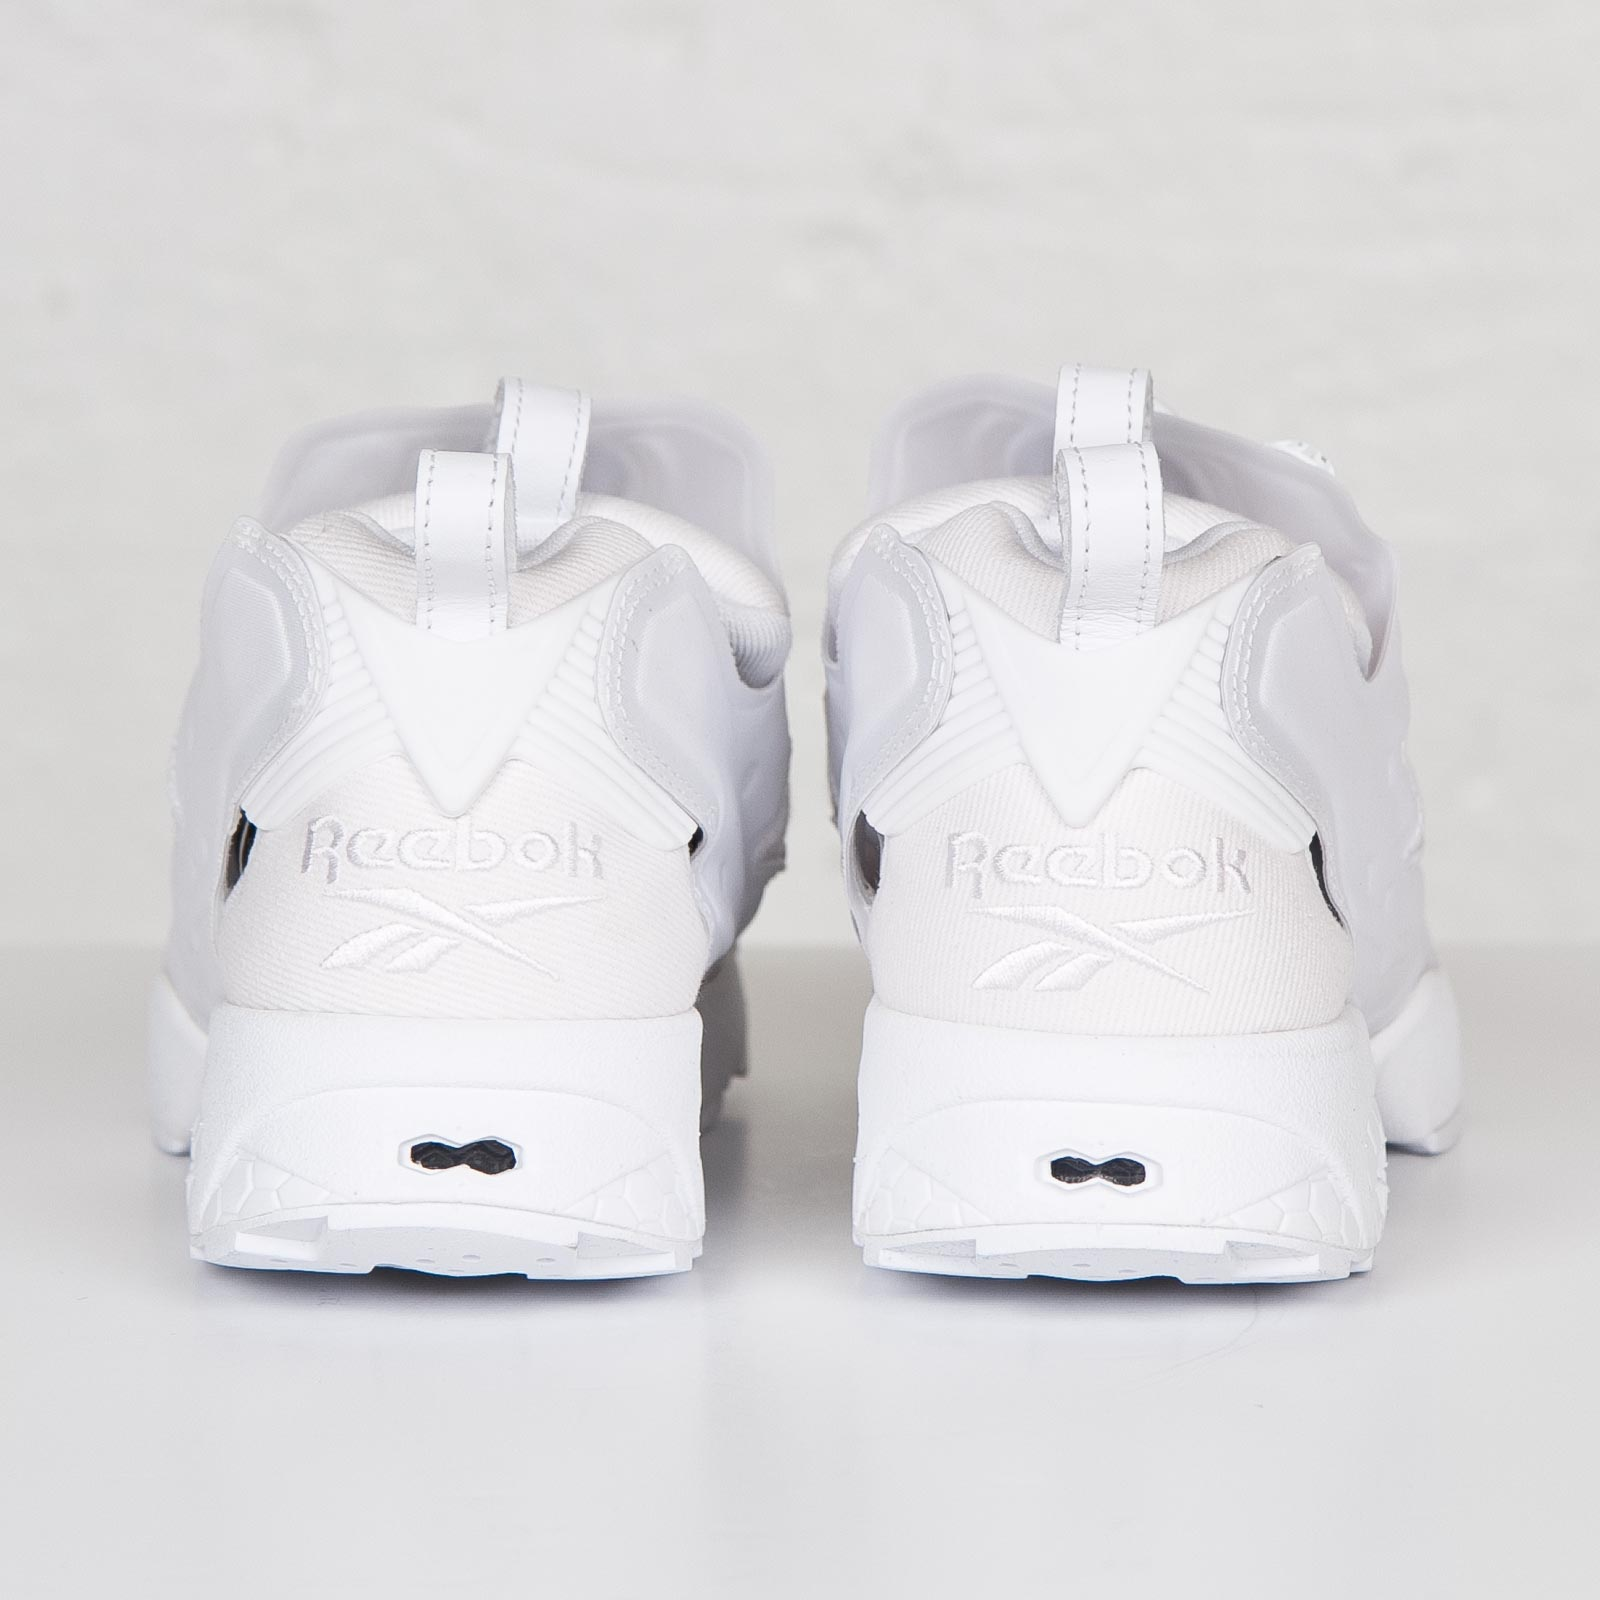 037c4b5e4a7a Reebok Instapump Fury OG - V63458 - Sneakersnstuff